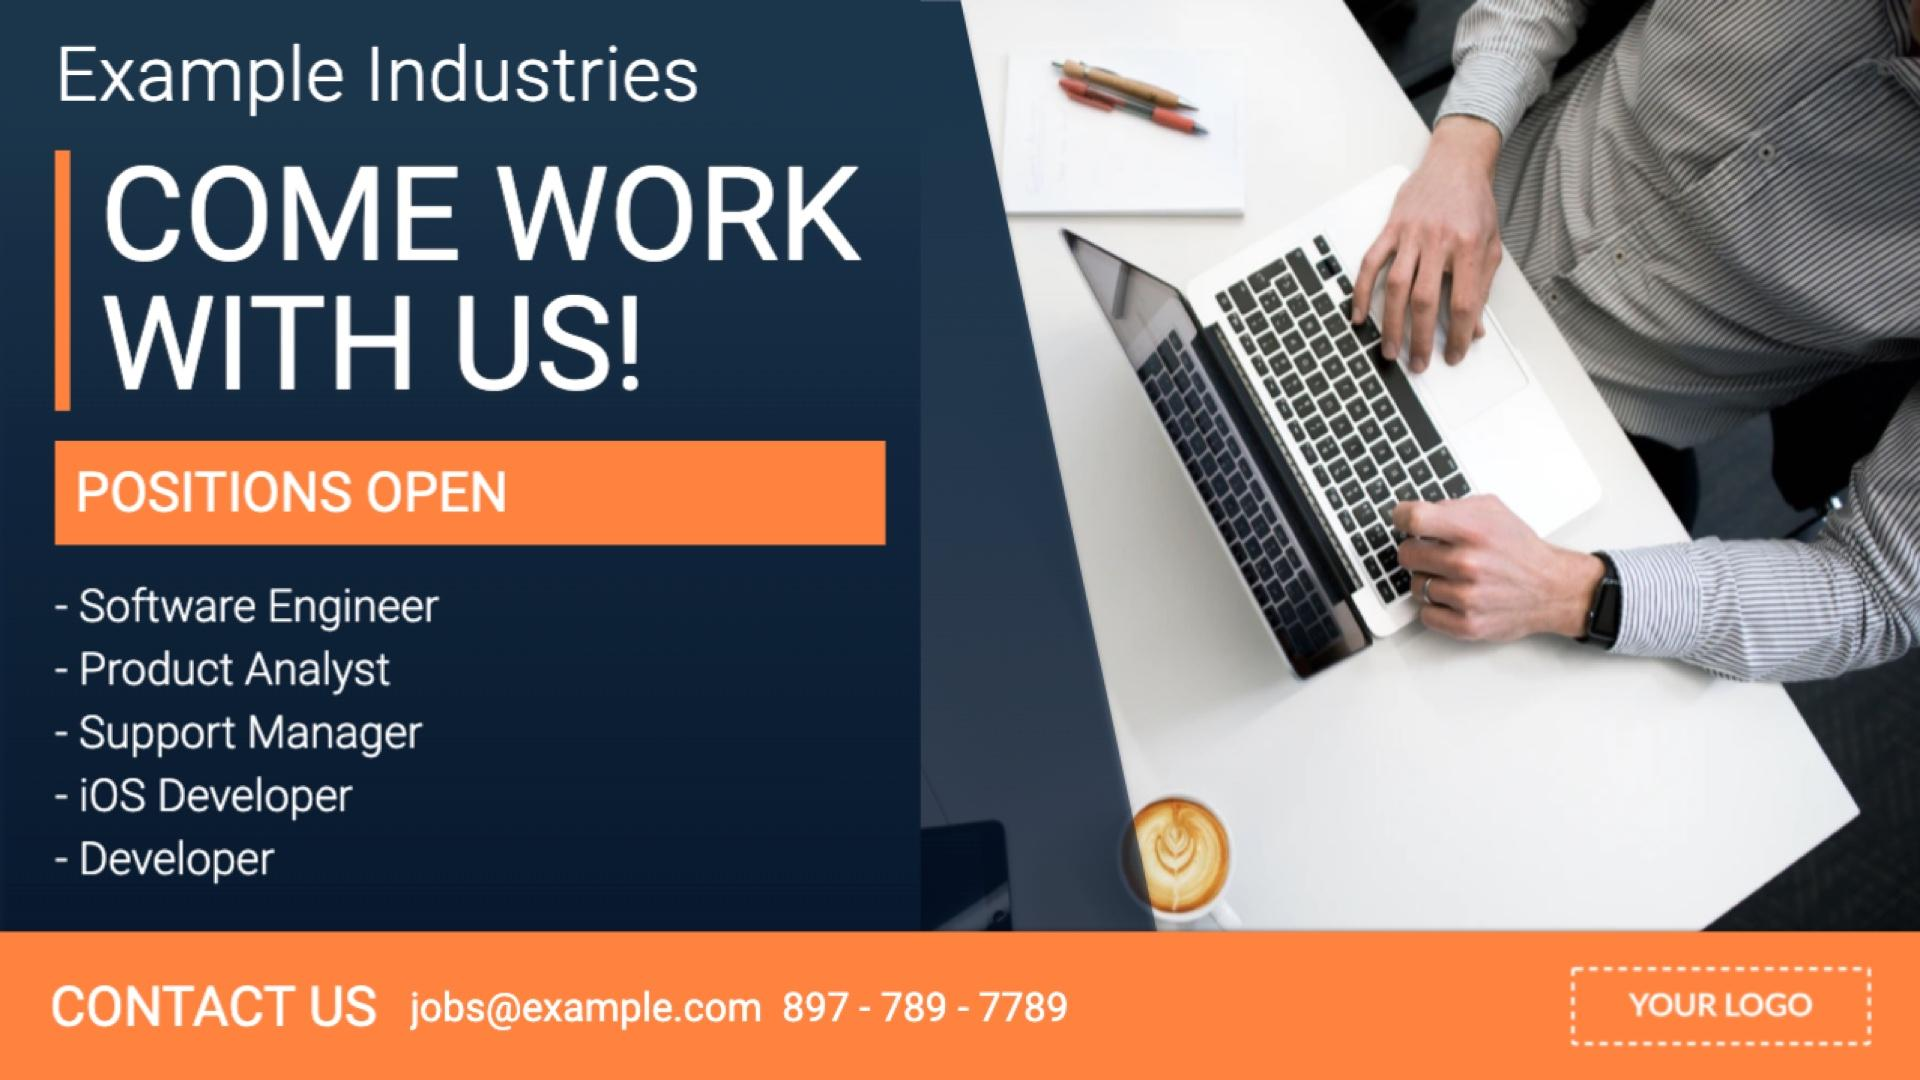 Announcement Job Posting Digital Signage Template